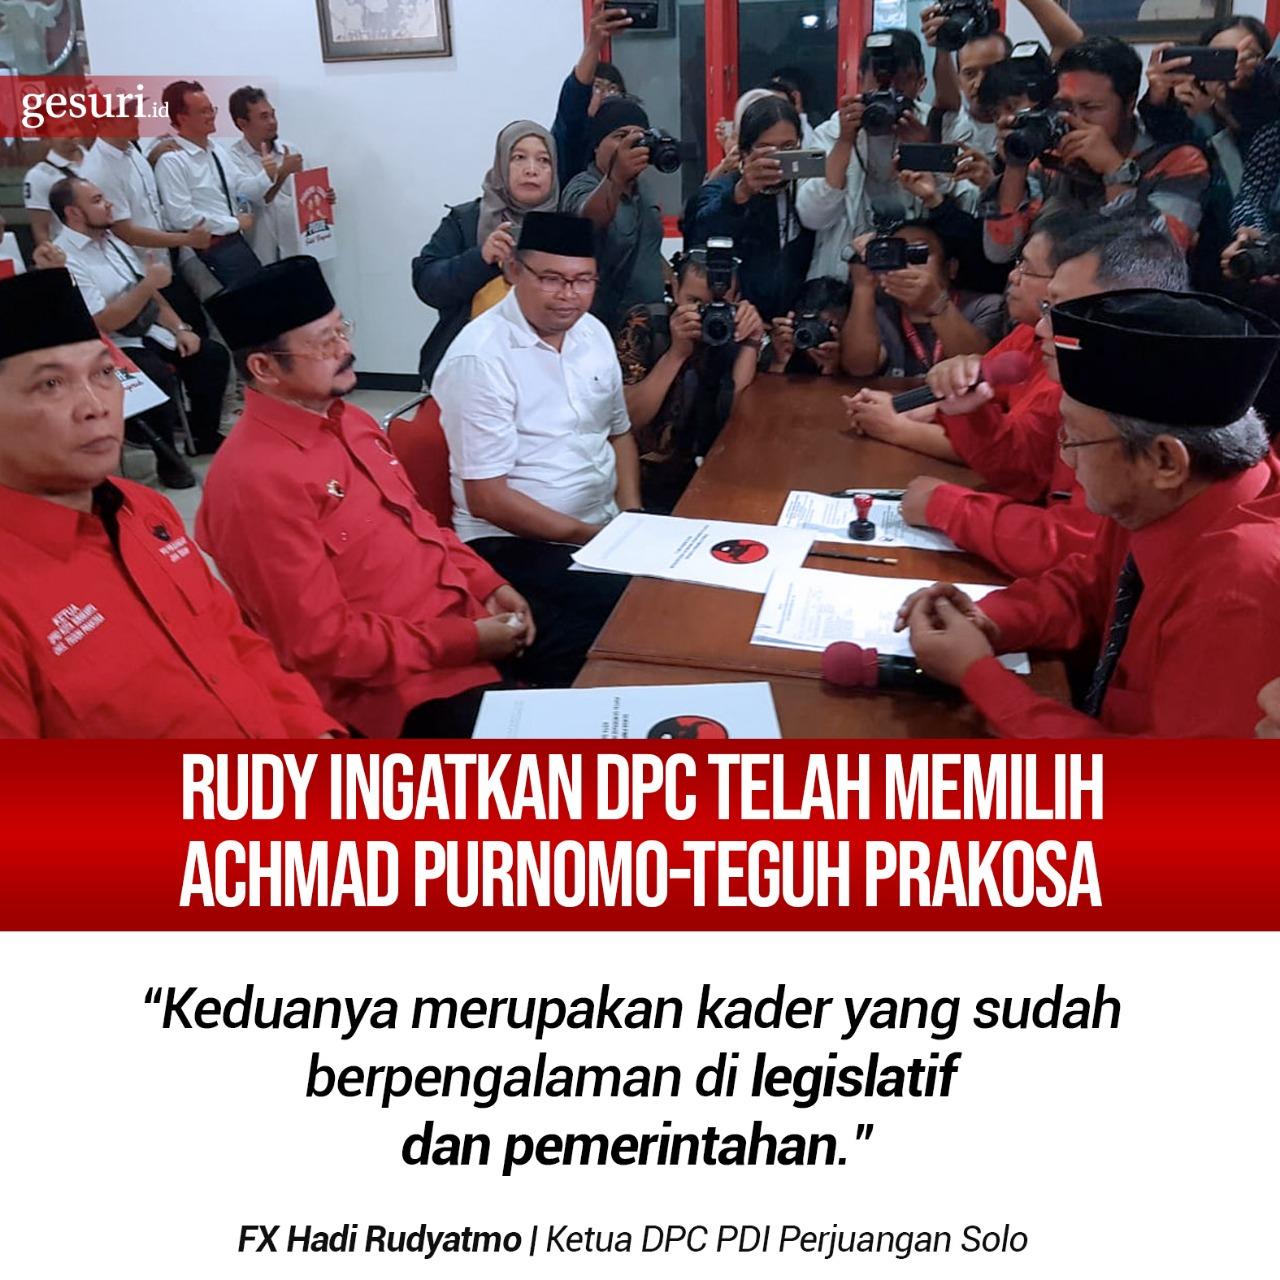 Rudy Ingatkan DPC Telah Pilih Achmad Purnomo-Teguh Prakosa